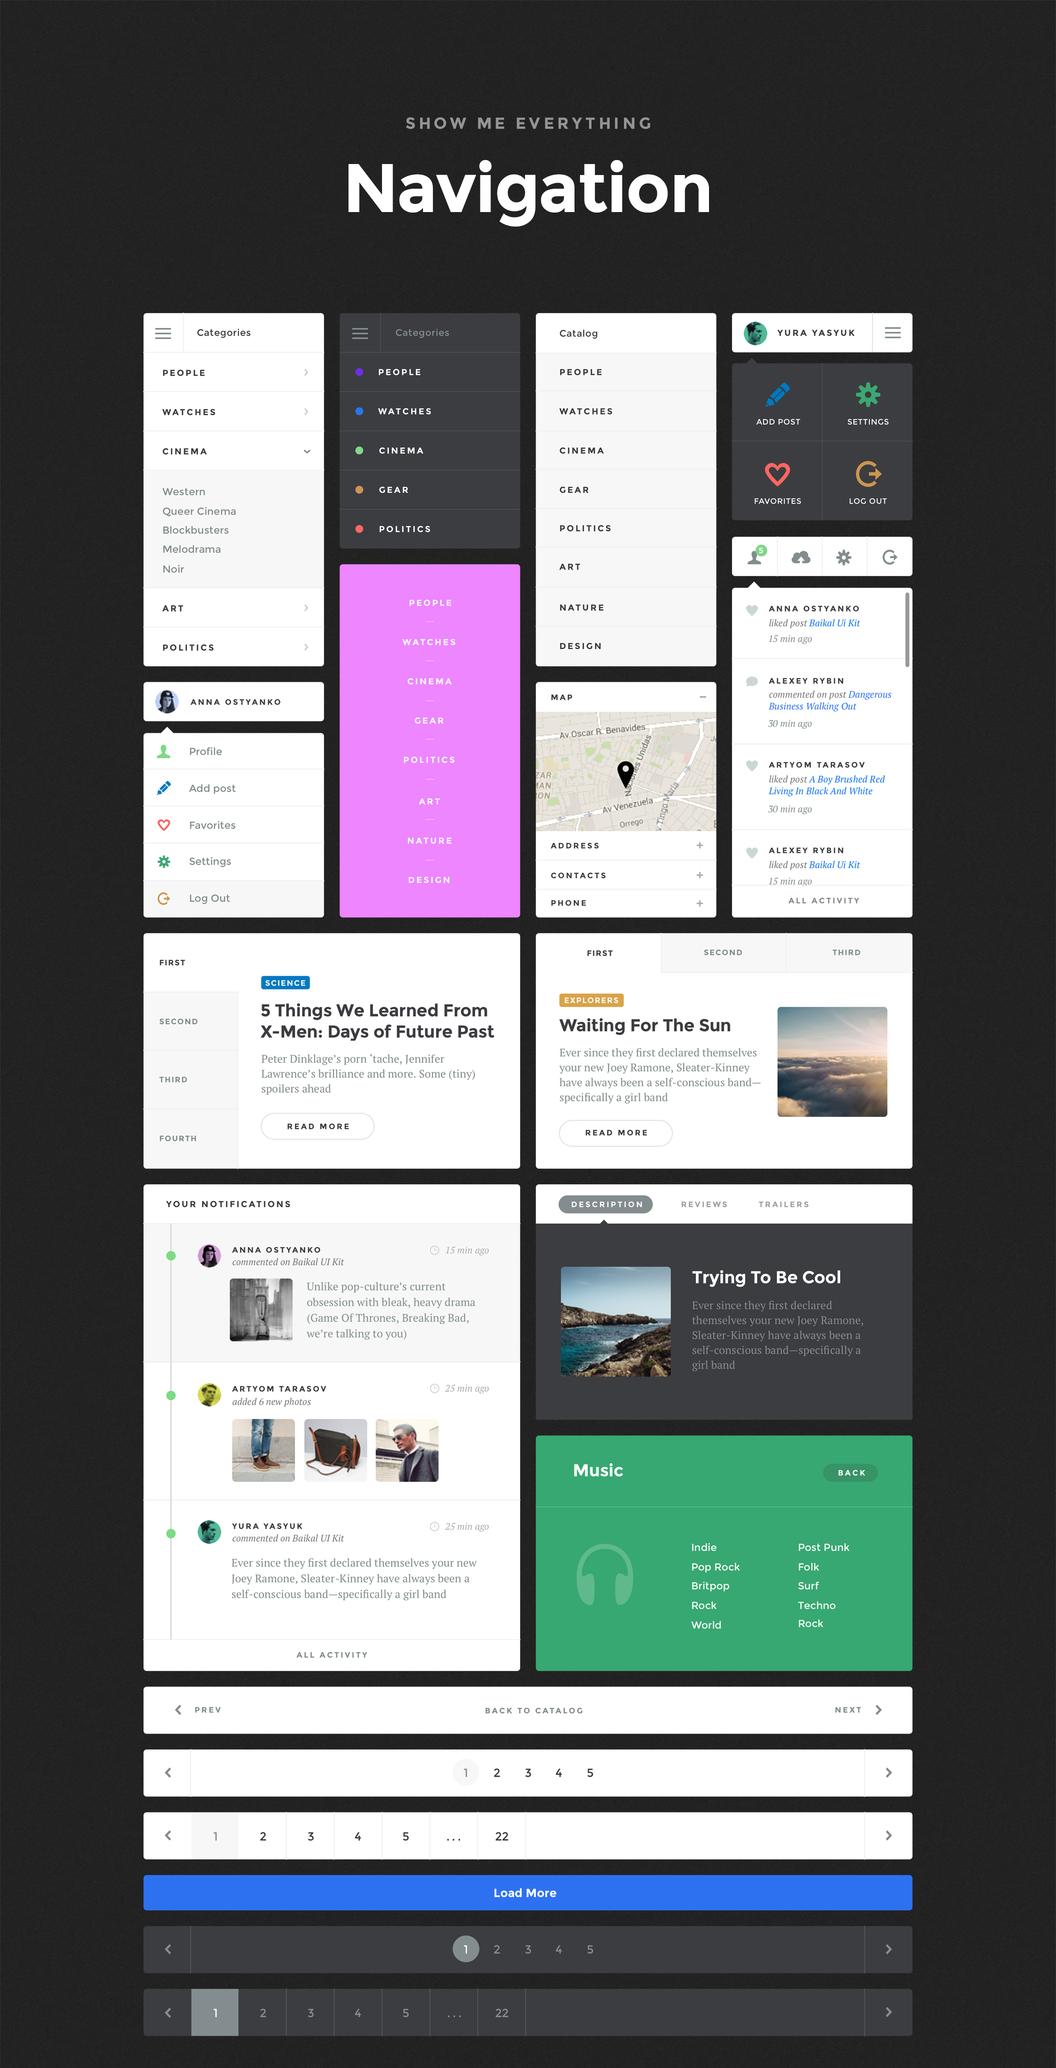 web ui design tools - full_Navigation_1421784270264